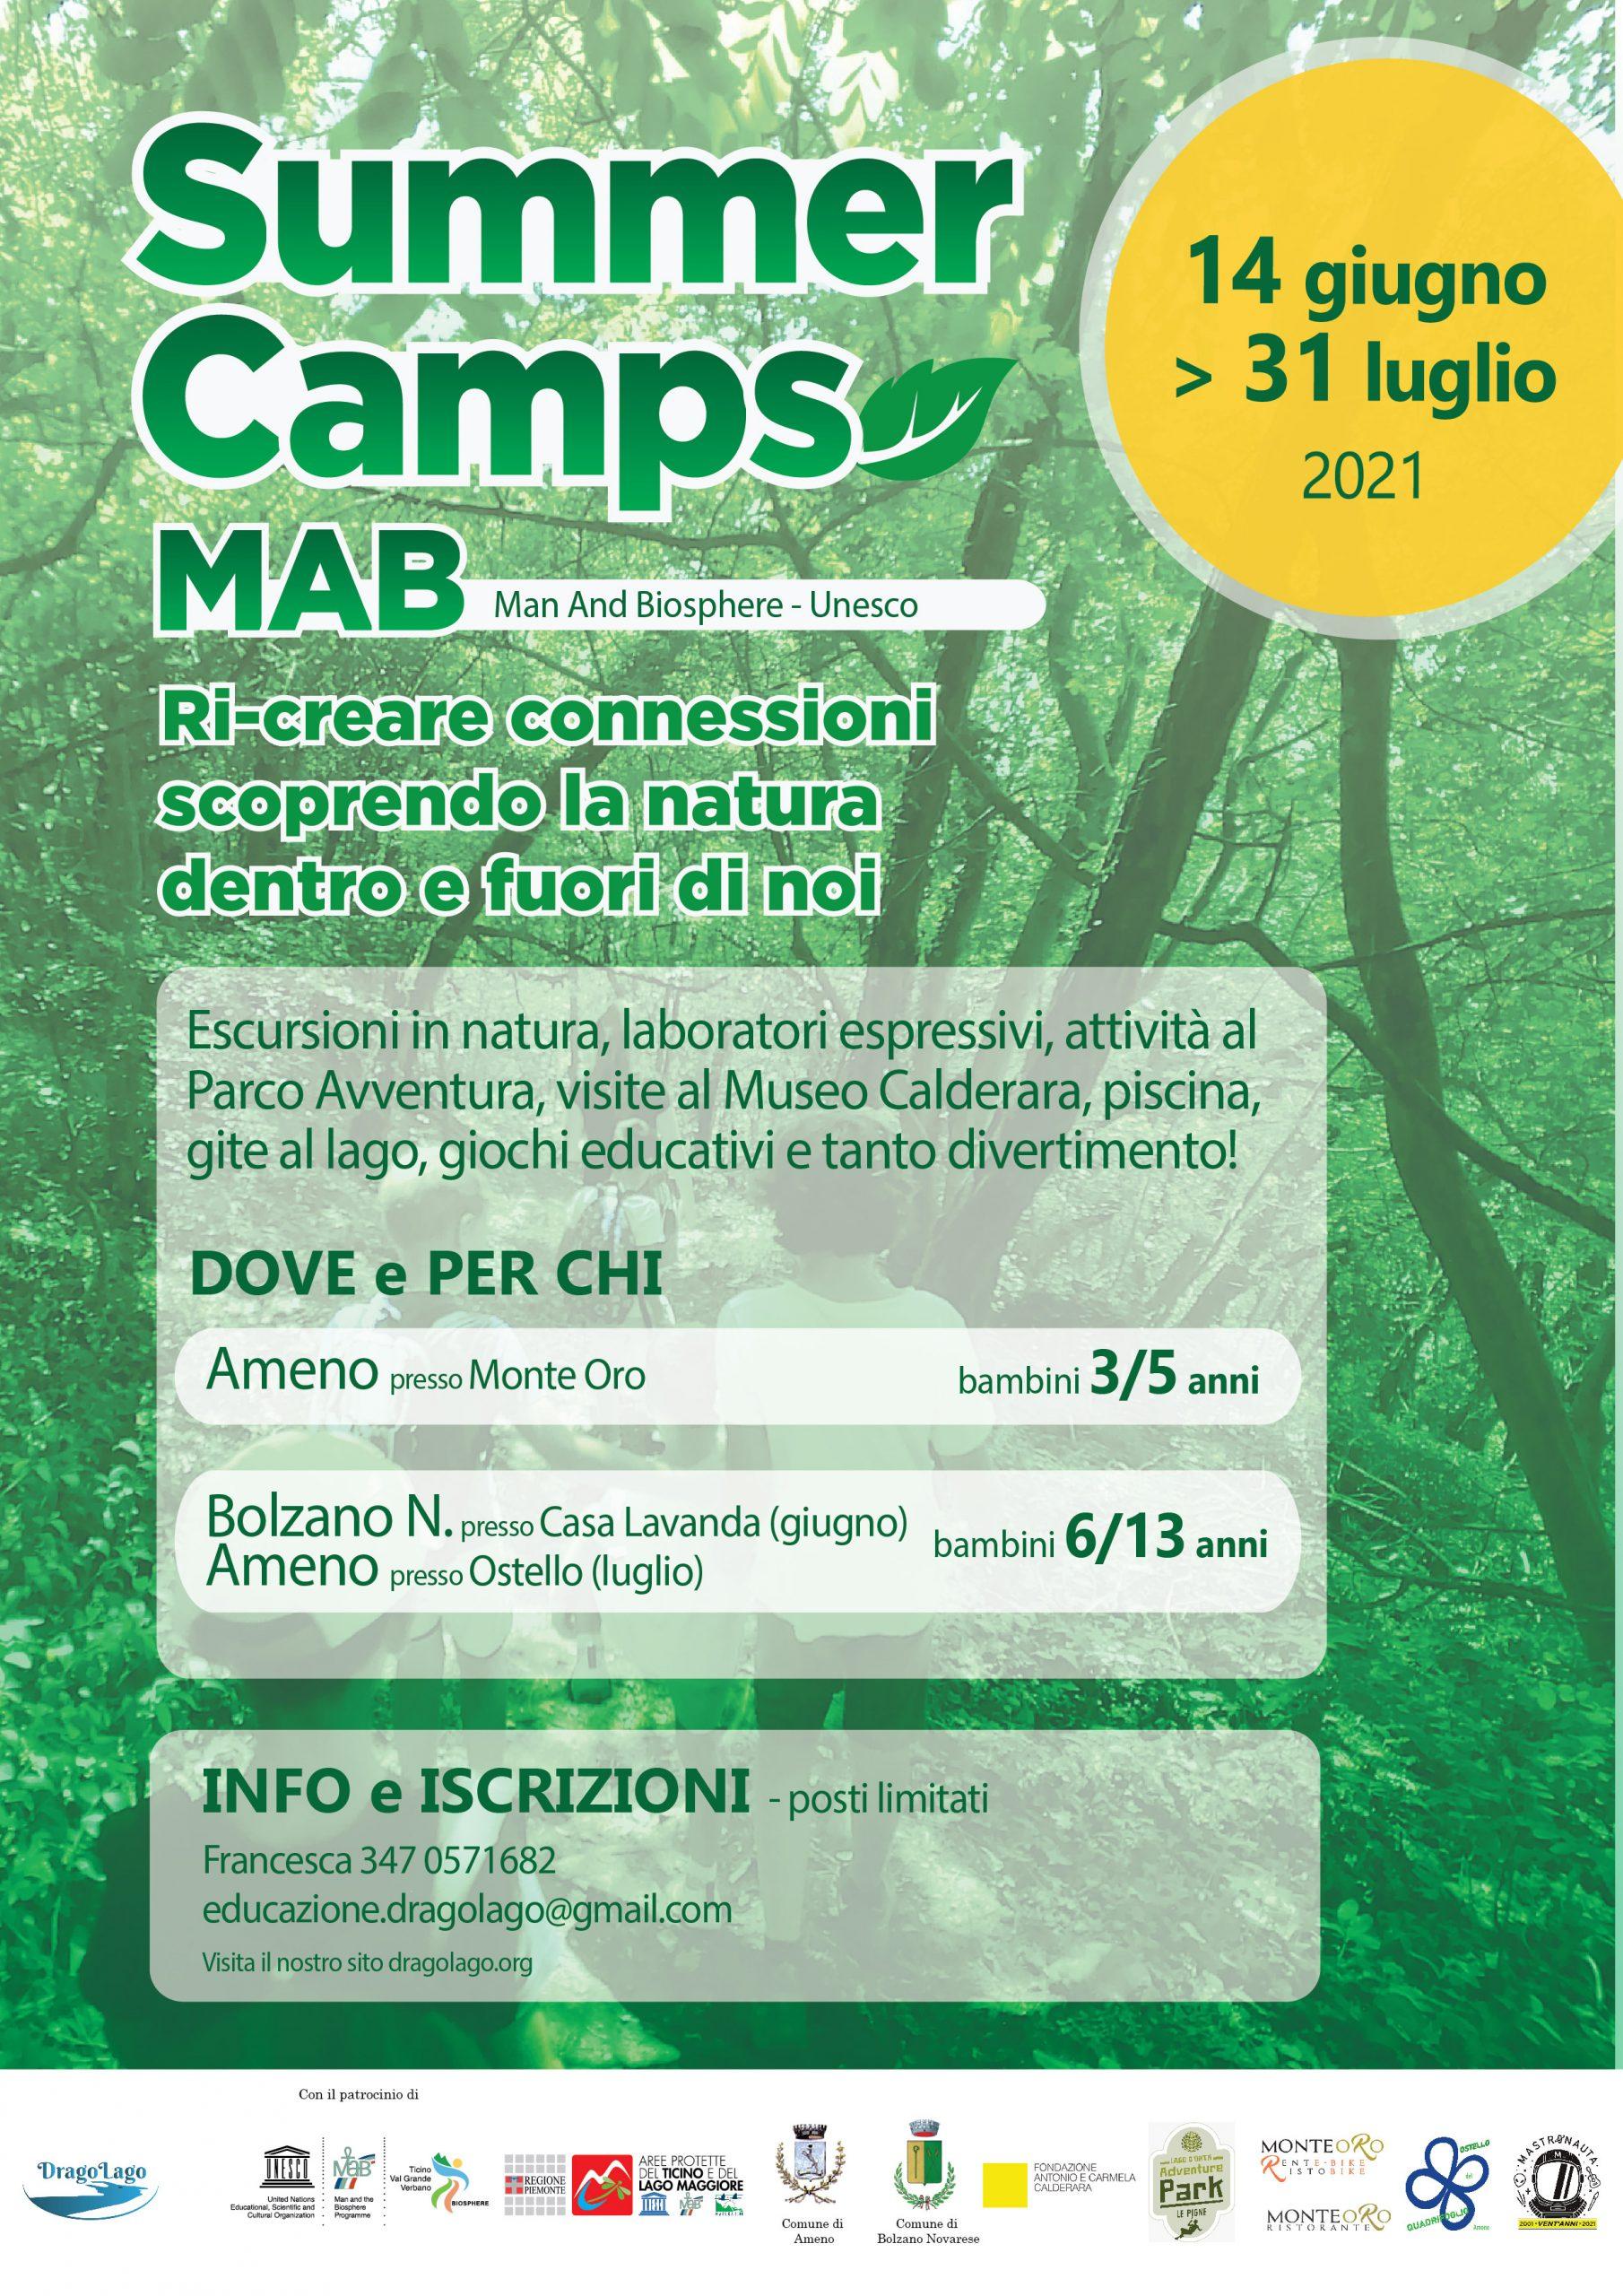 Summer Camp MAB